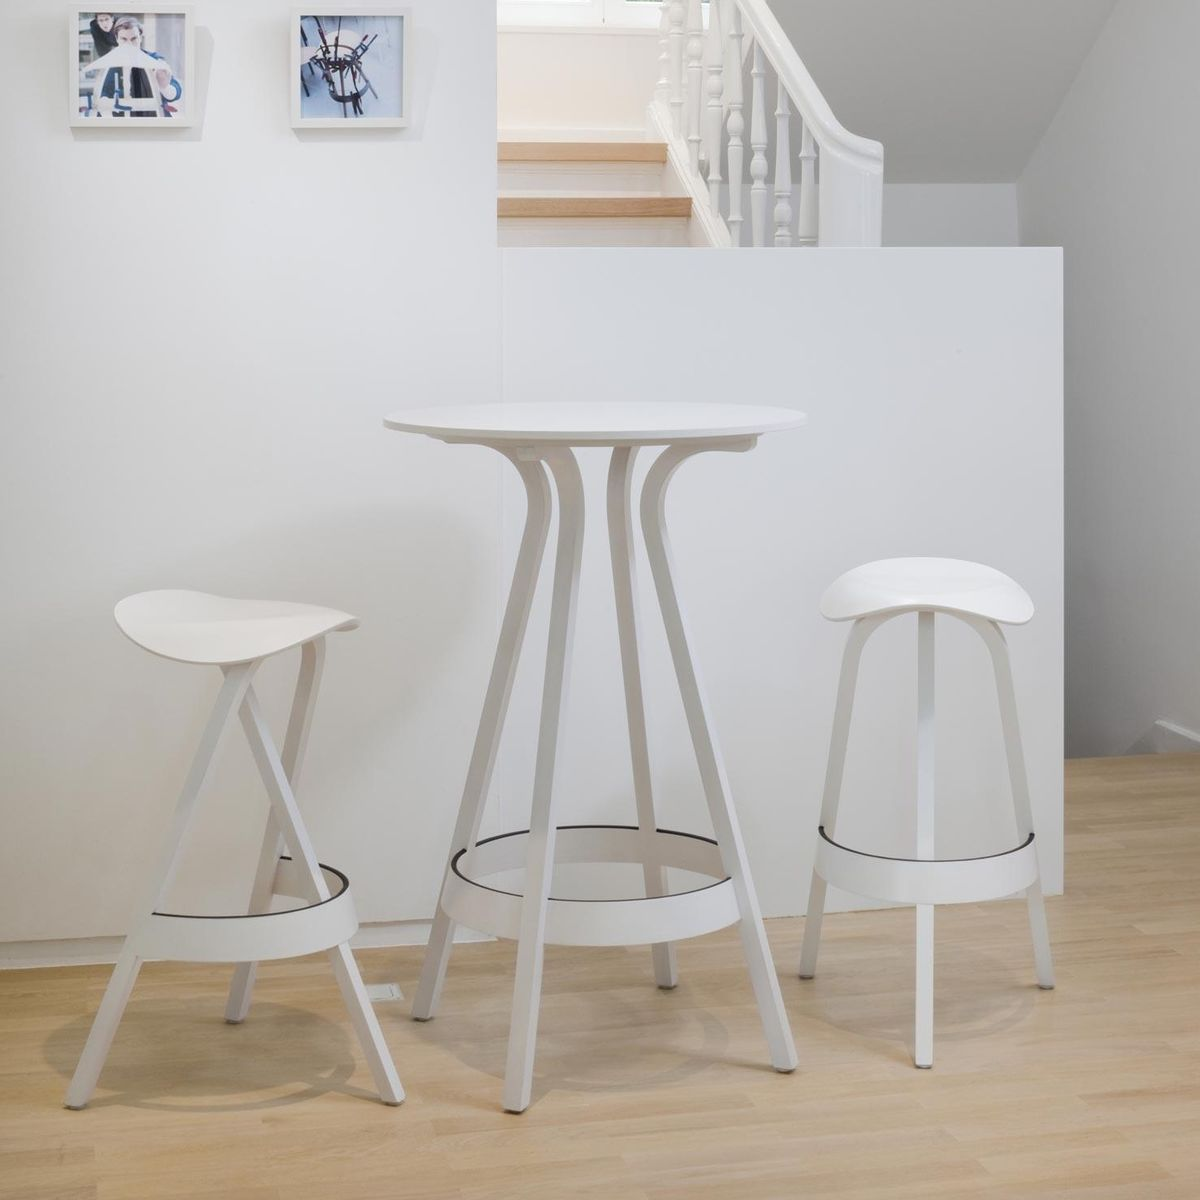 thonet 404 h bar stool 77cm thonet. Black Bedroom Furniture Sets. Home Design Ideas